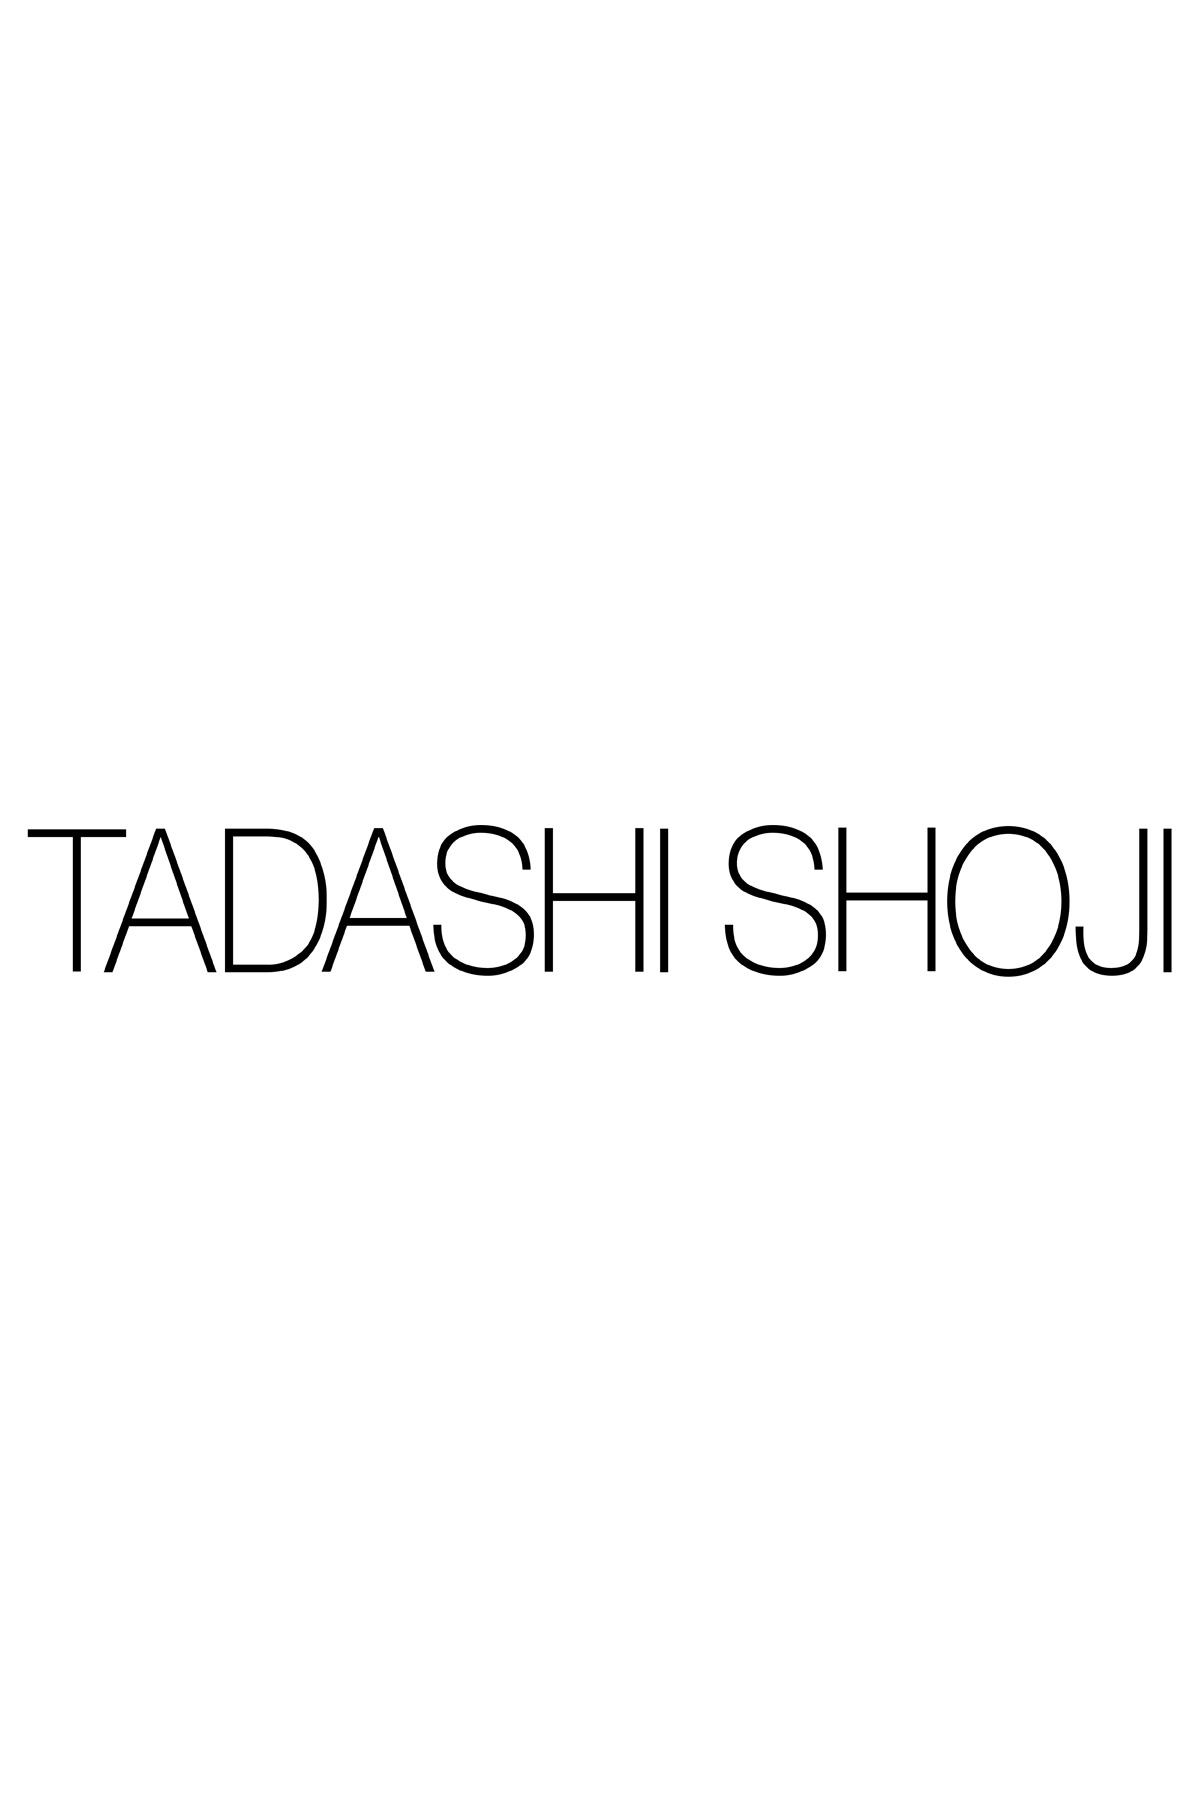 Tadashi Shoji - Drusa Chiffon Lace Tea-Length Dress - PLUS SIZE